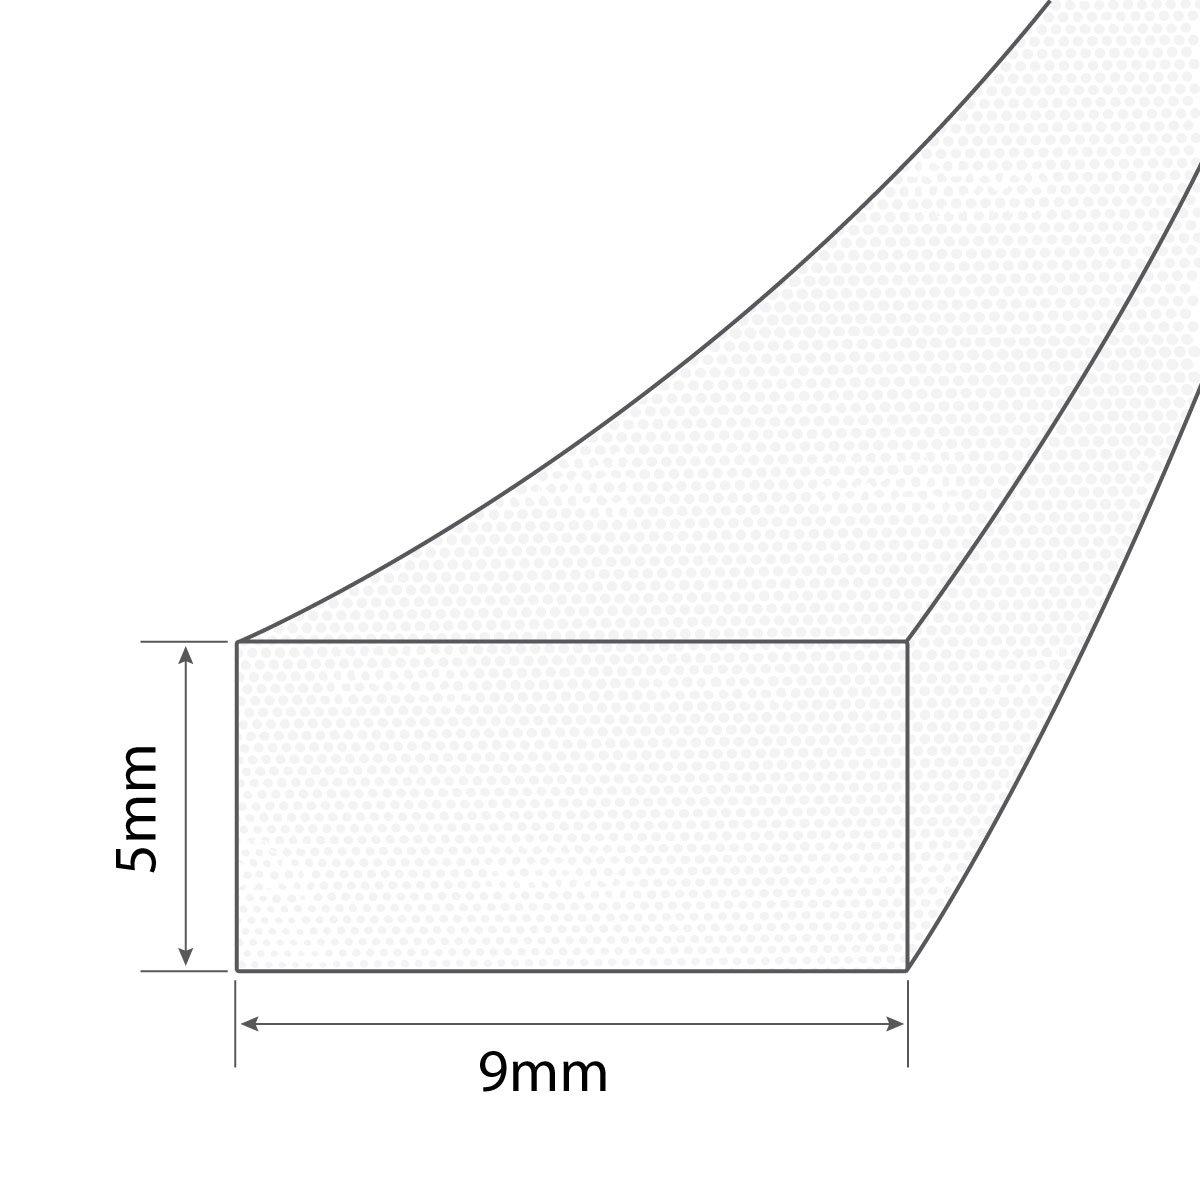 Material PU-Schaum STEIGNER Schaumstoffdichtung selbstklebend I-Profil WEISS 6m 5x9mm